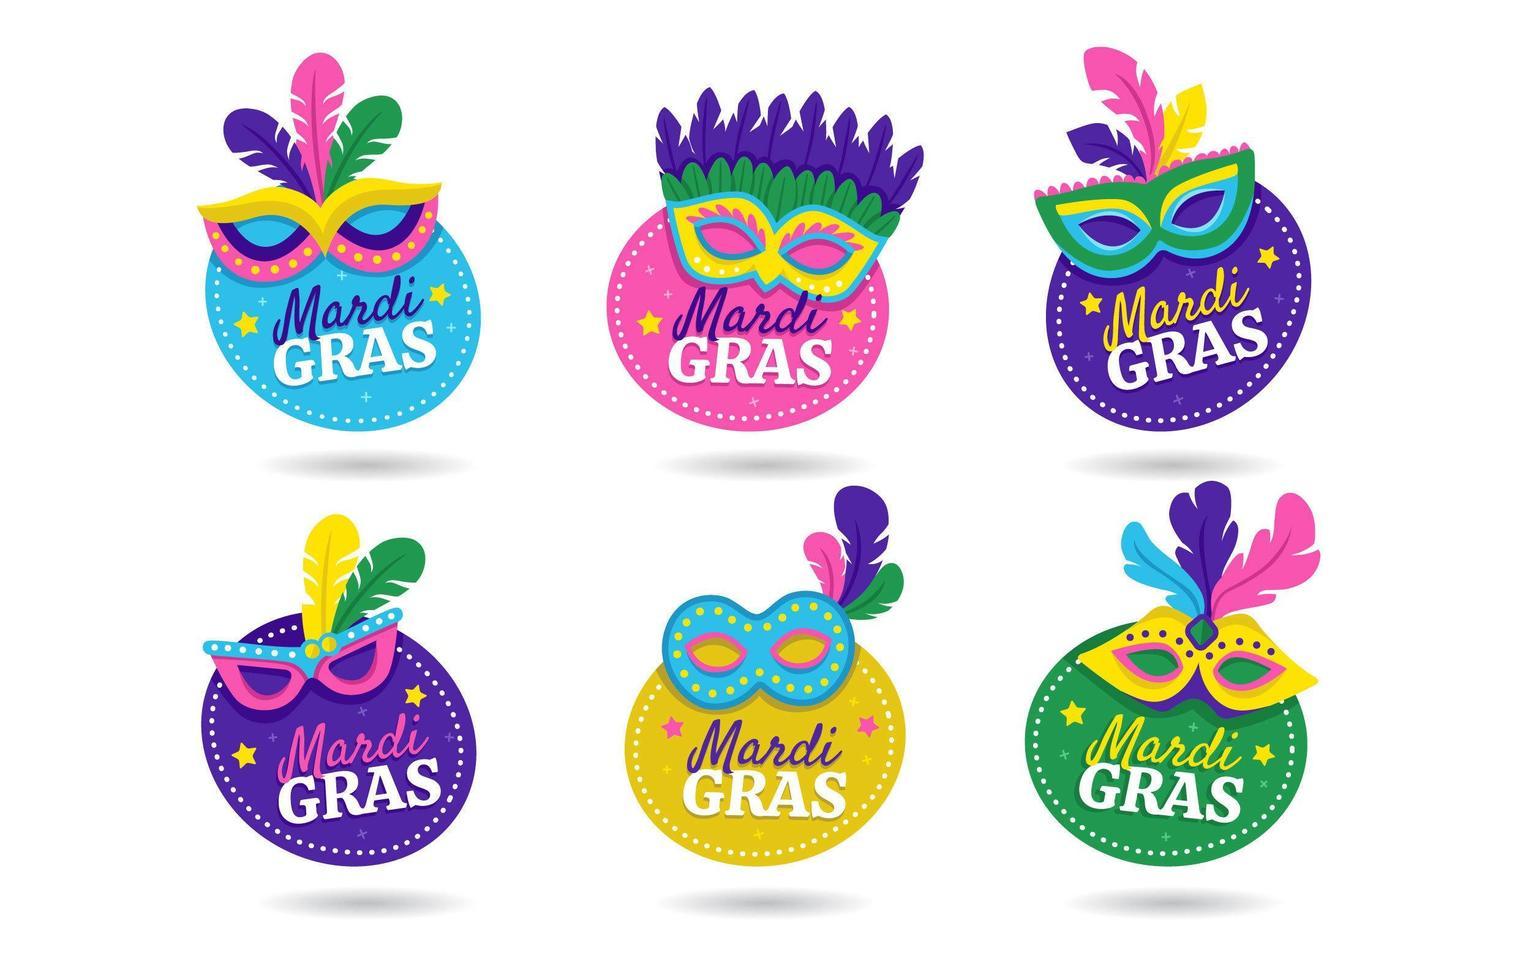 Mardi Gras Mask Label Sticker vector